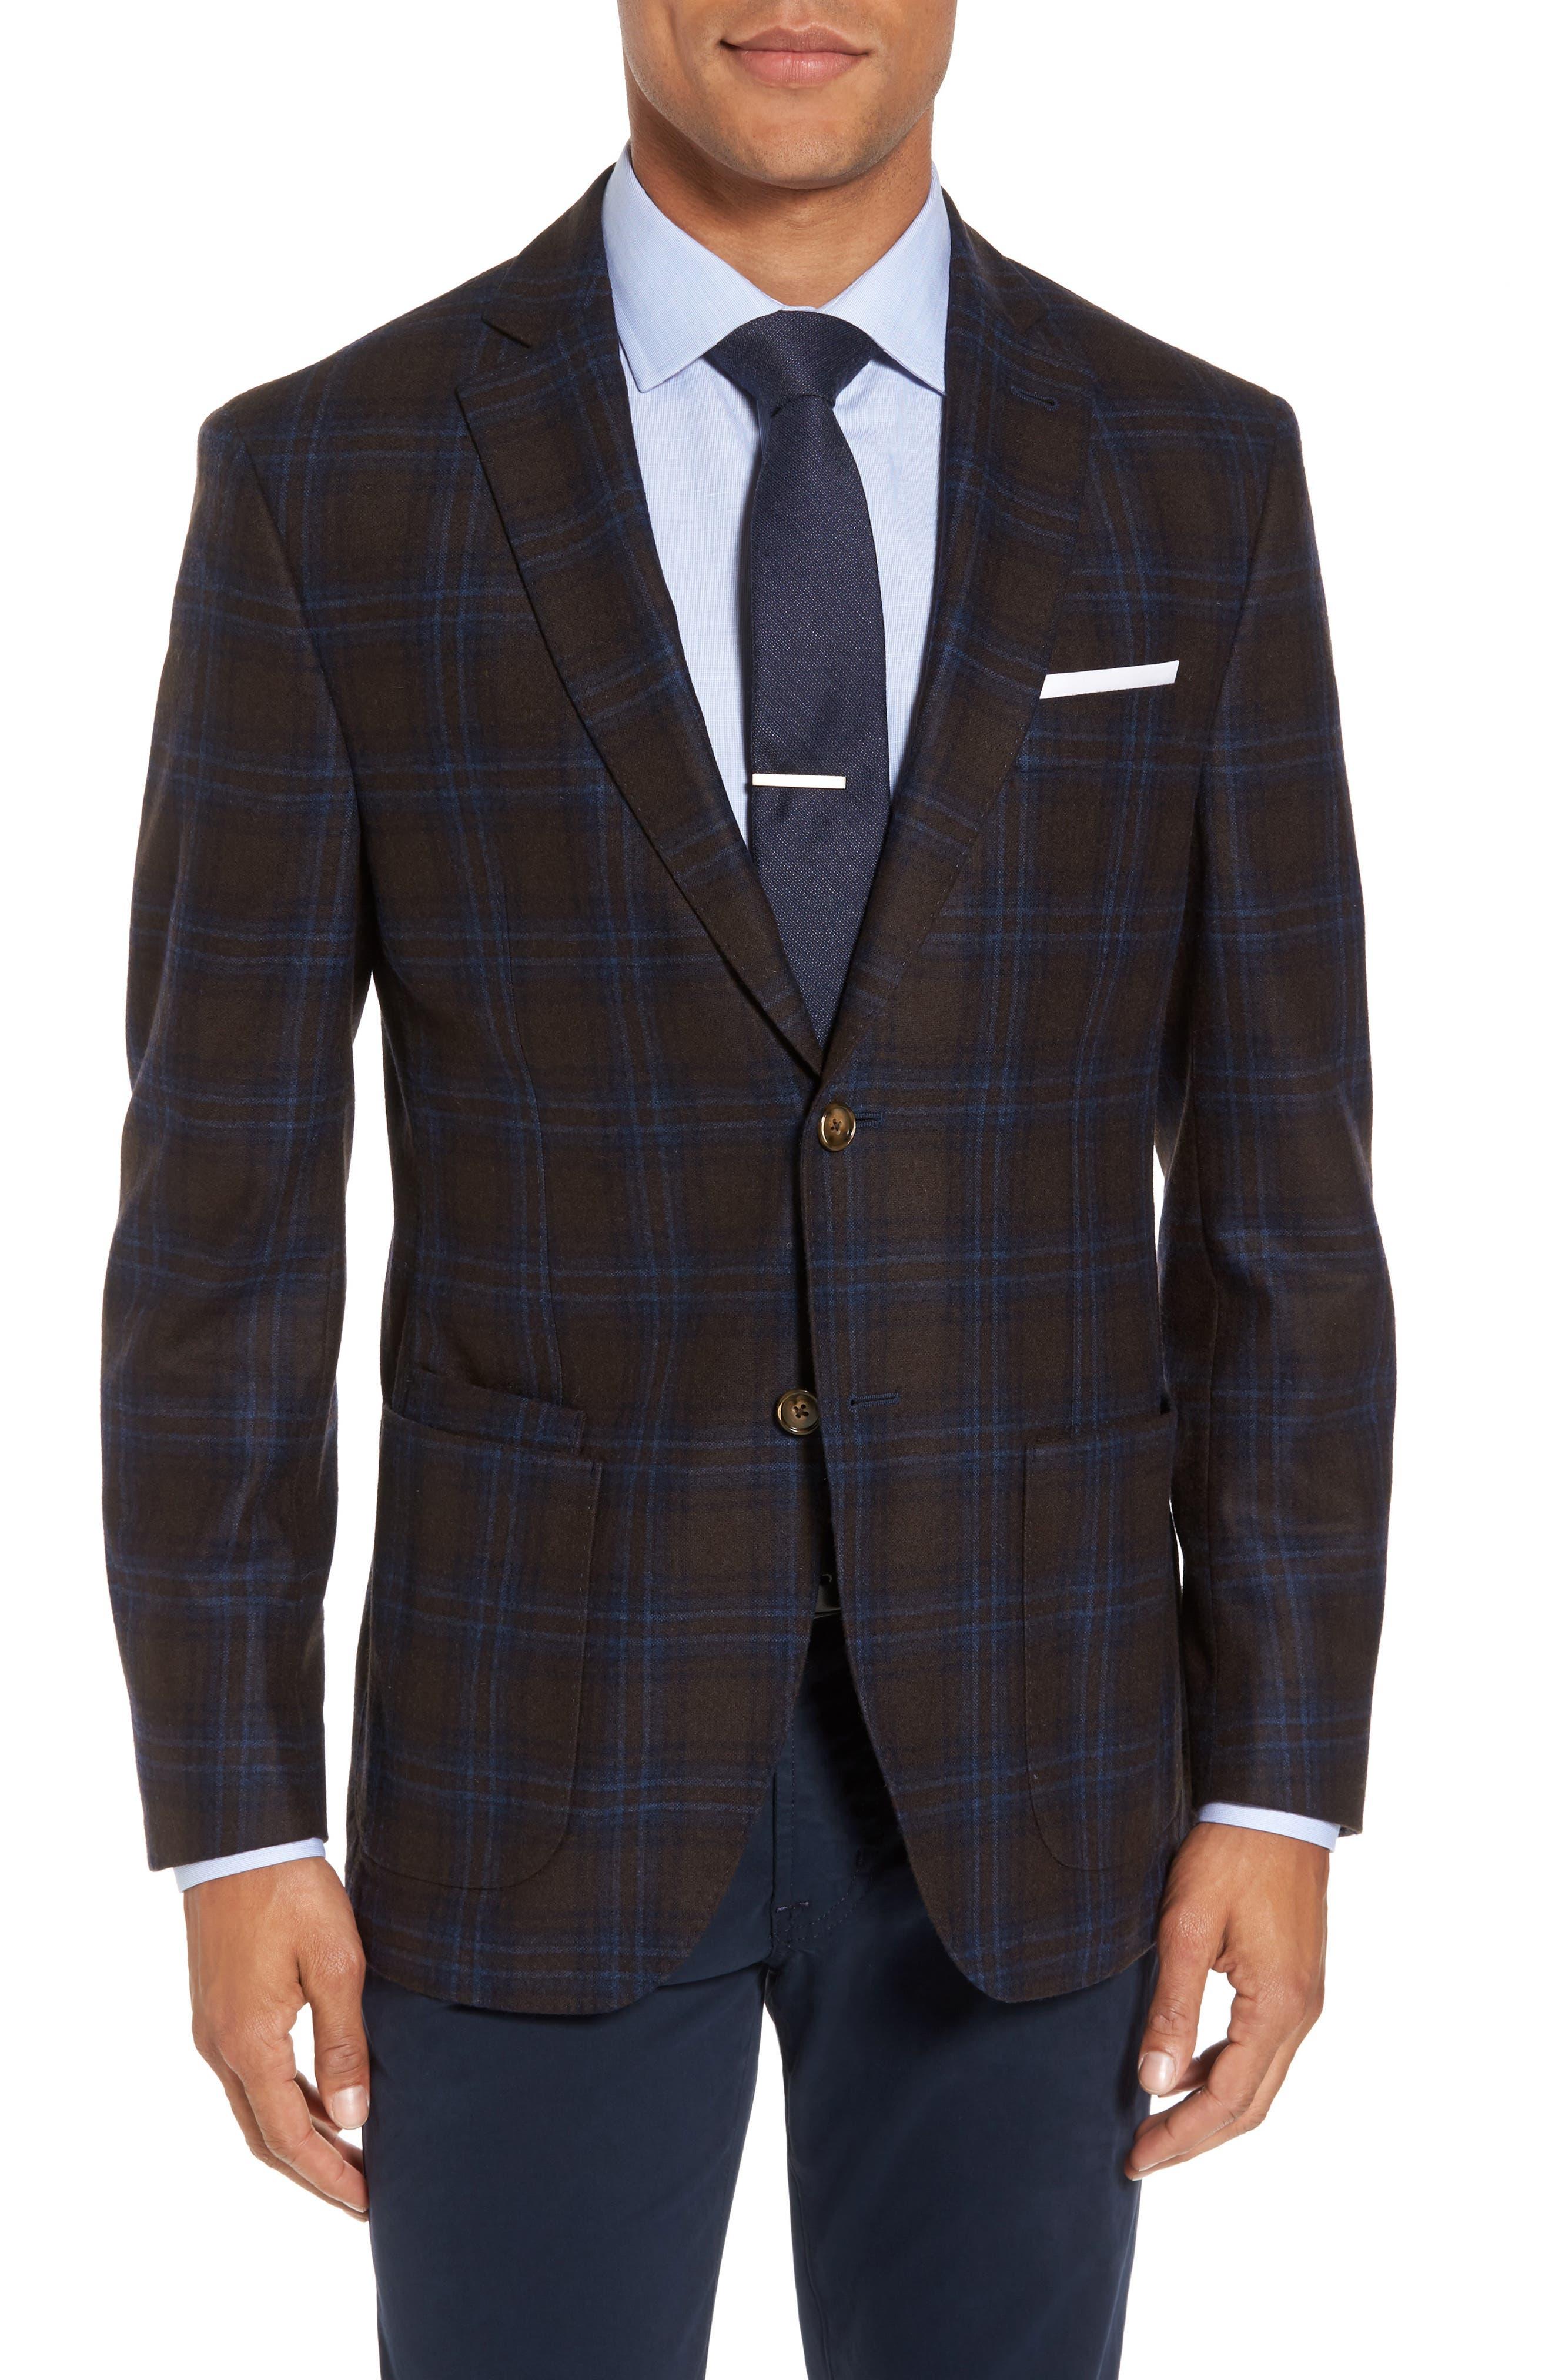 Main Image - JKT New York Trim Fit Plaid Wool Blend Sport Coat